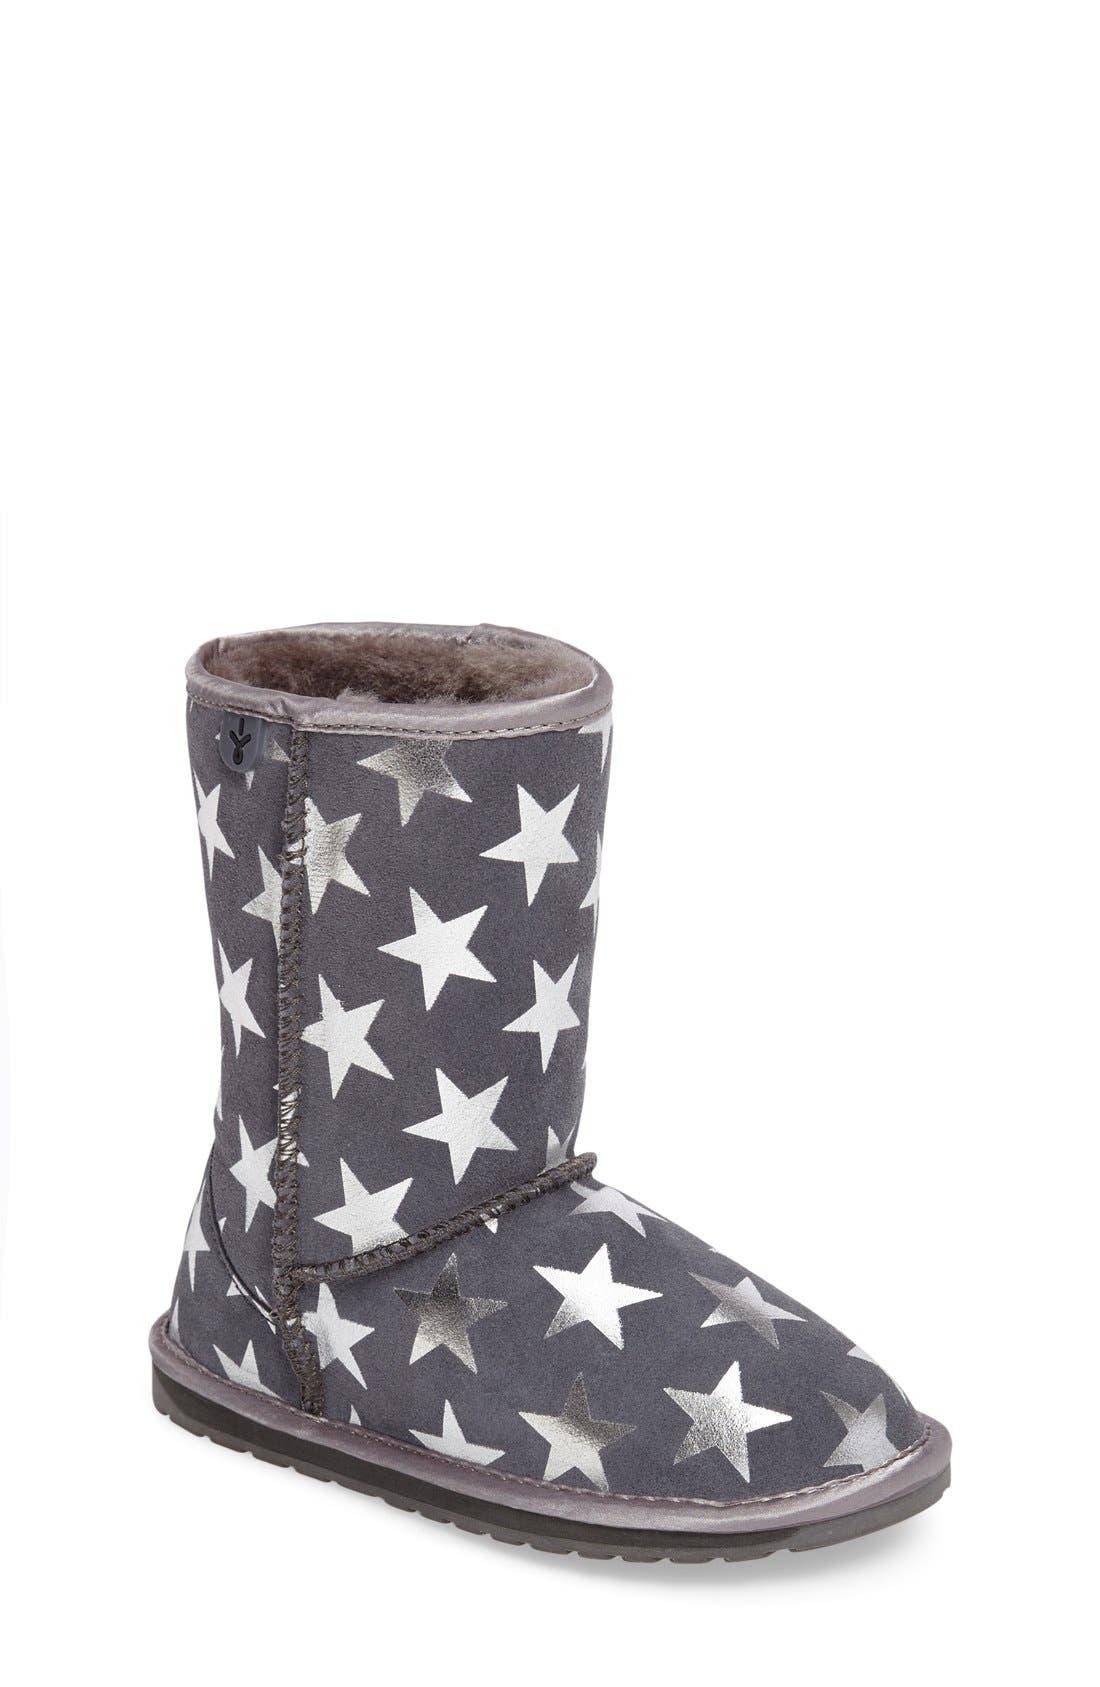 EMU AUSTRALIA EMUAustralia Starry Night Boot